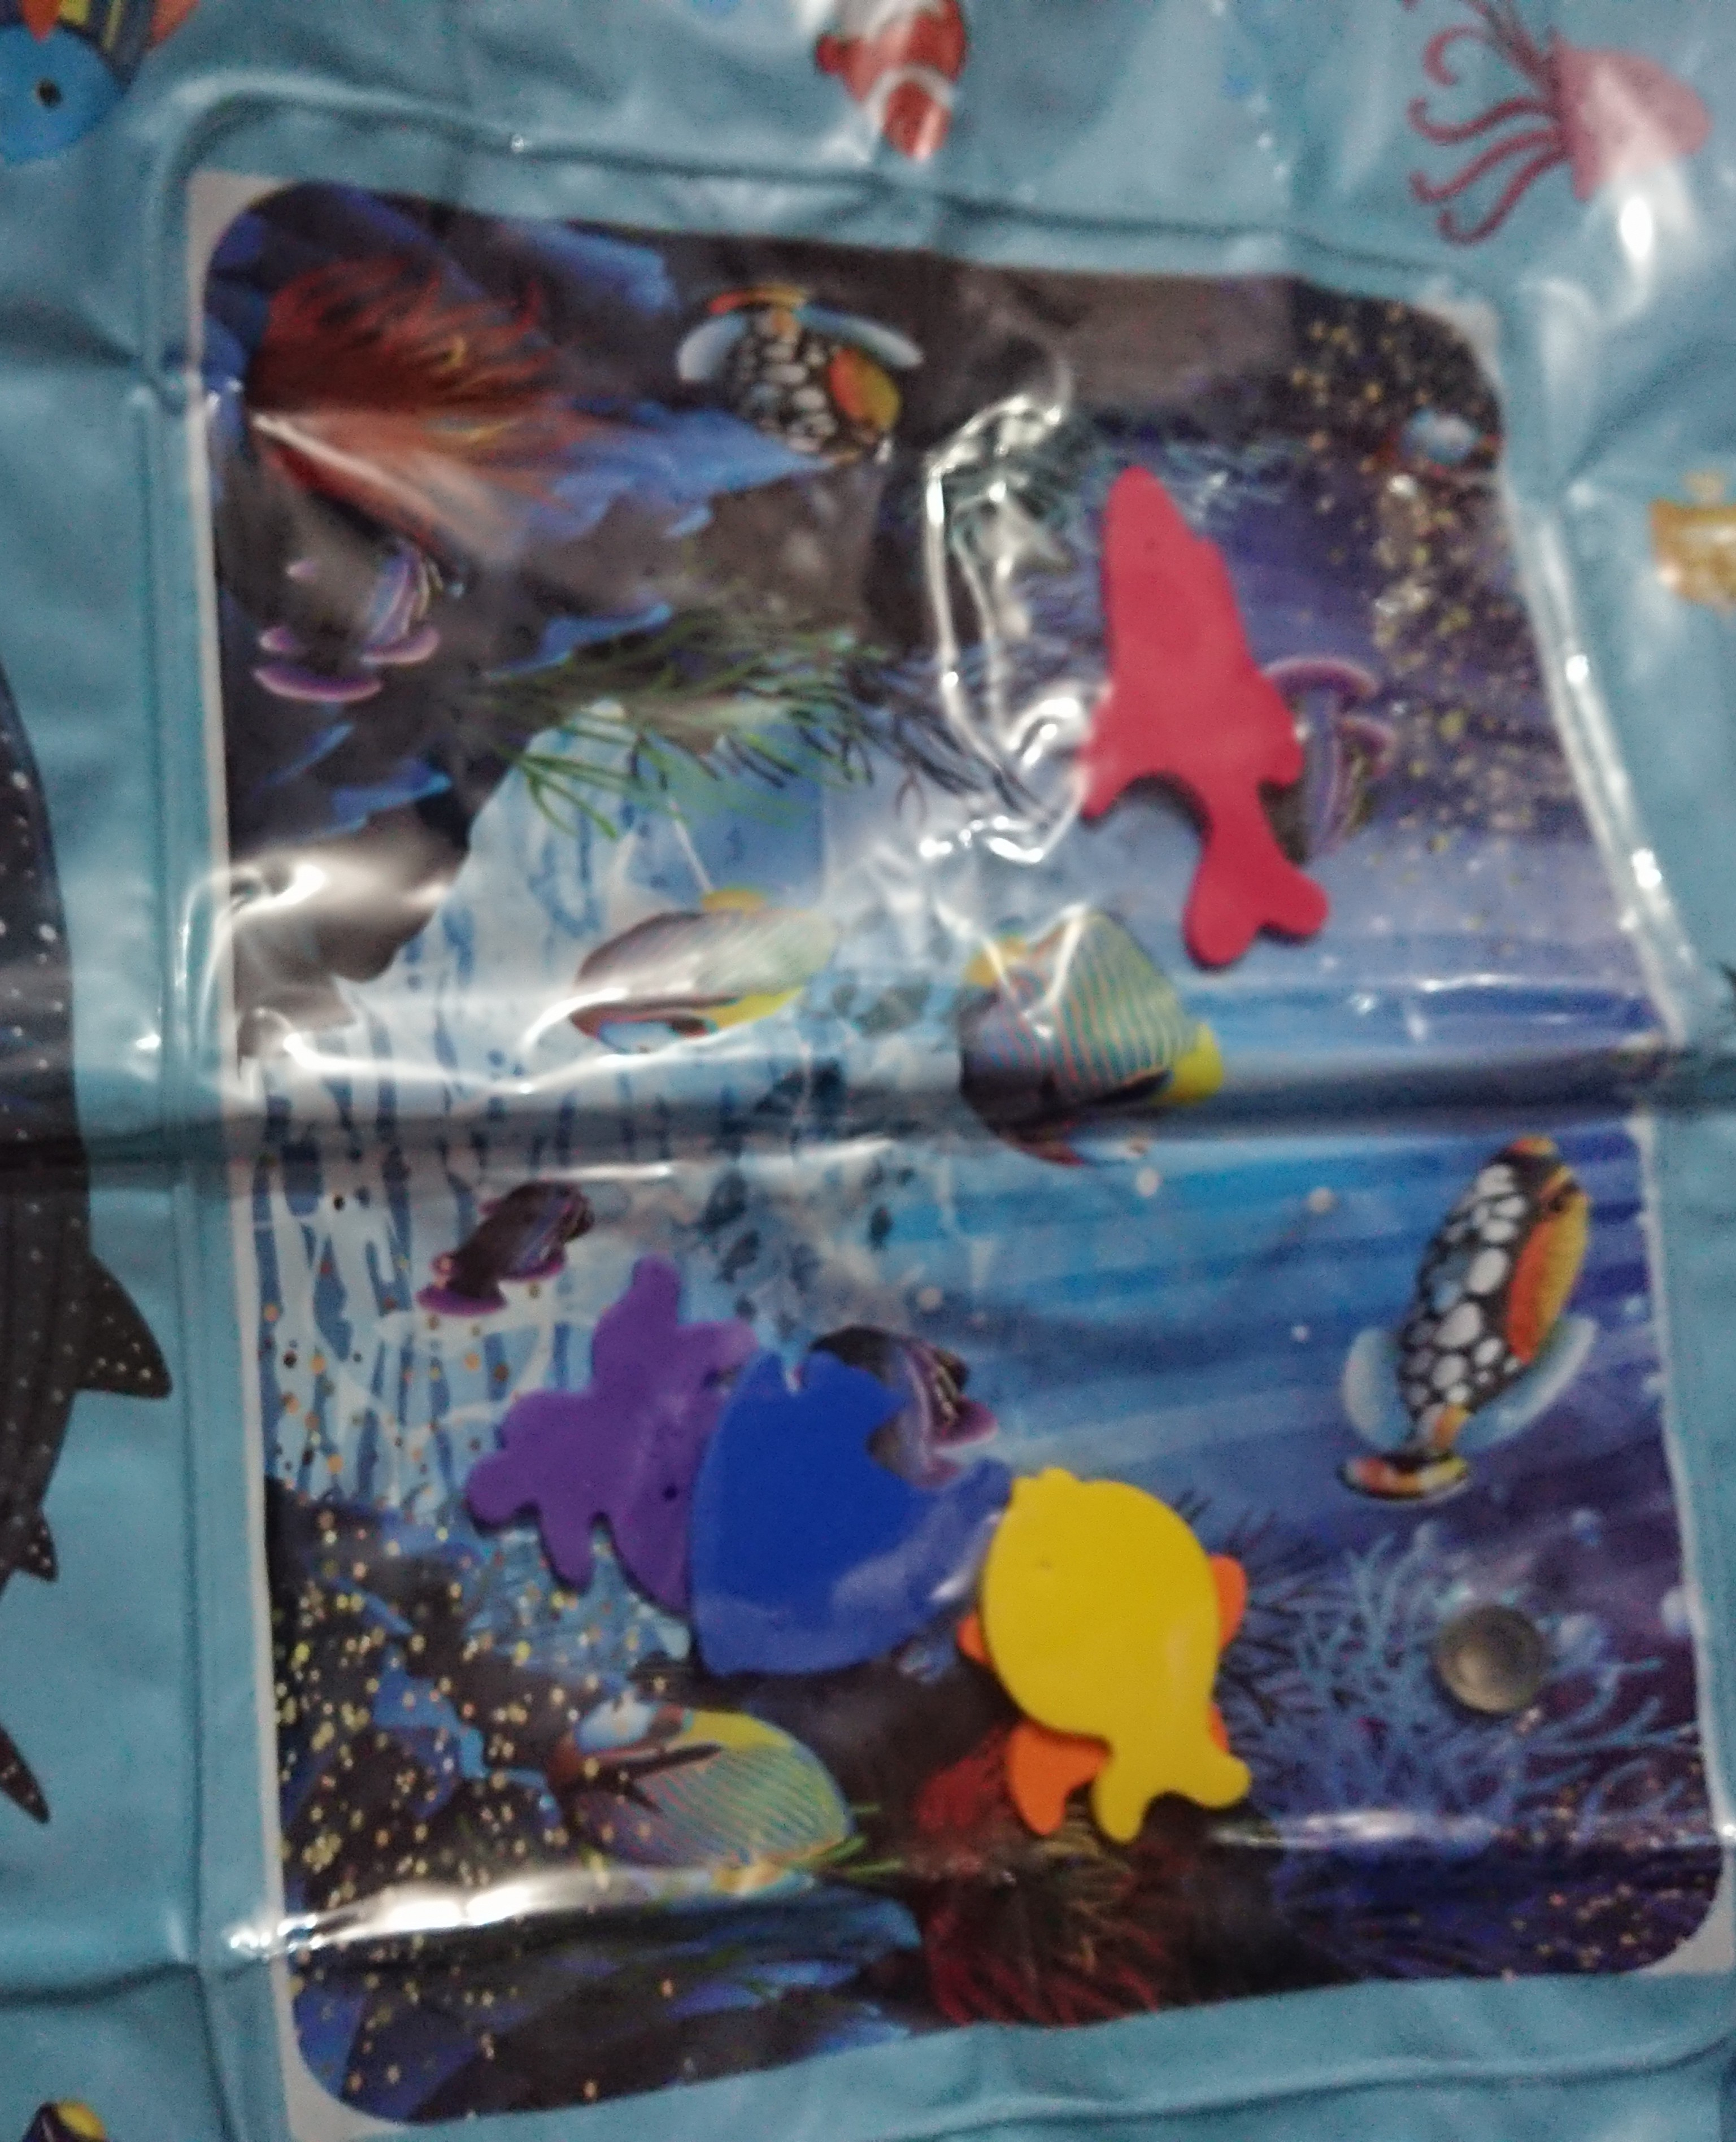 Baby Play Mat Alphabet With Sea Animals Print-Baby Play Mat Alphabet With Sea Animals Print-By priya2502